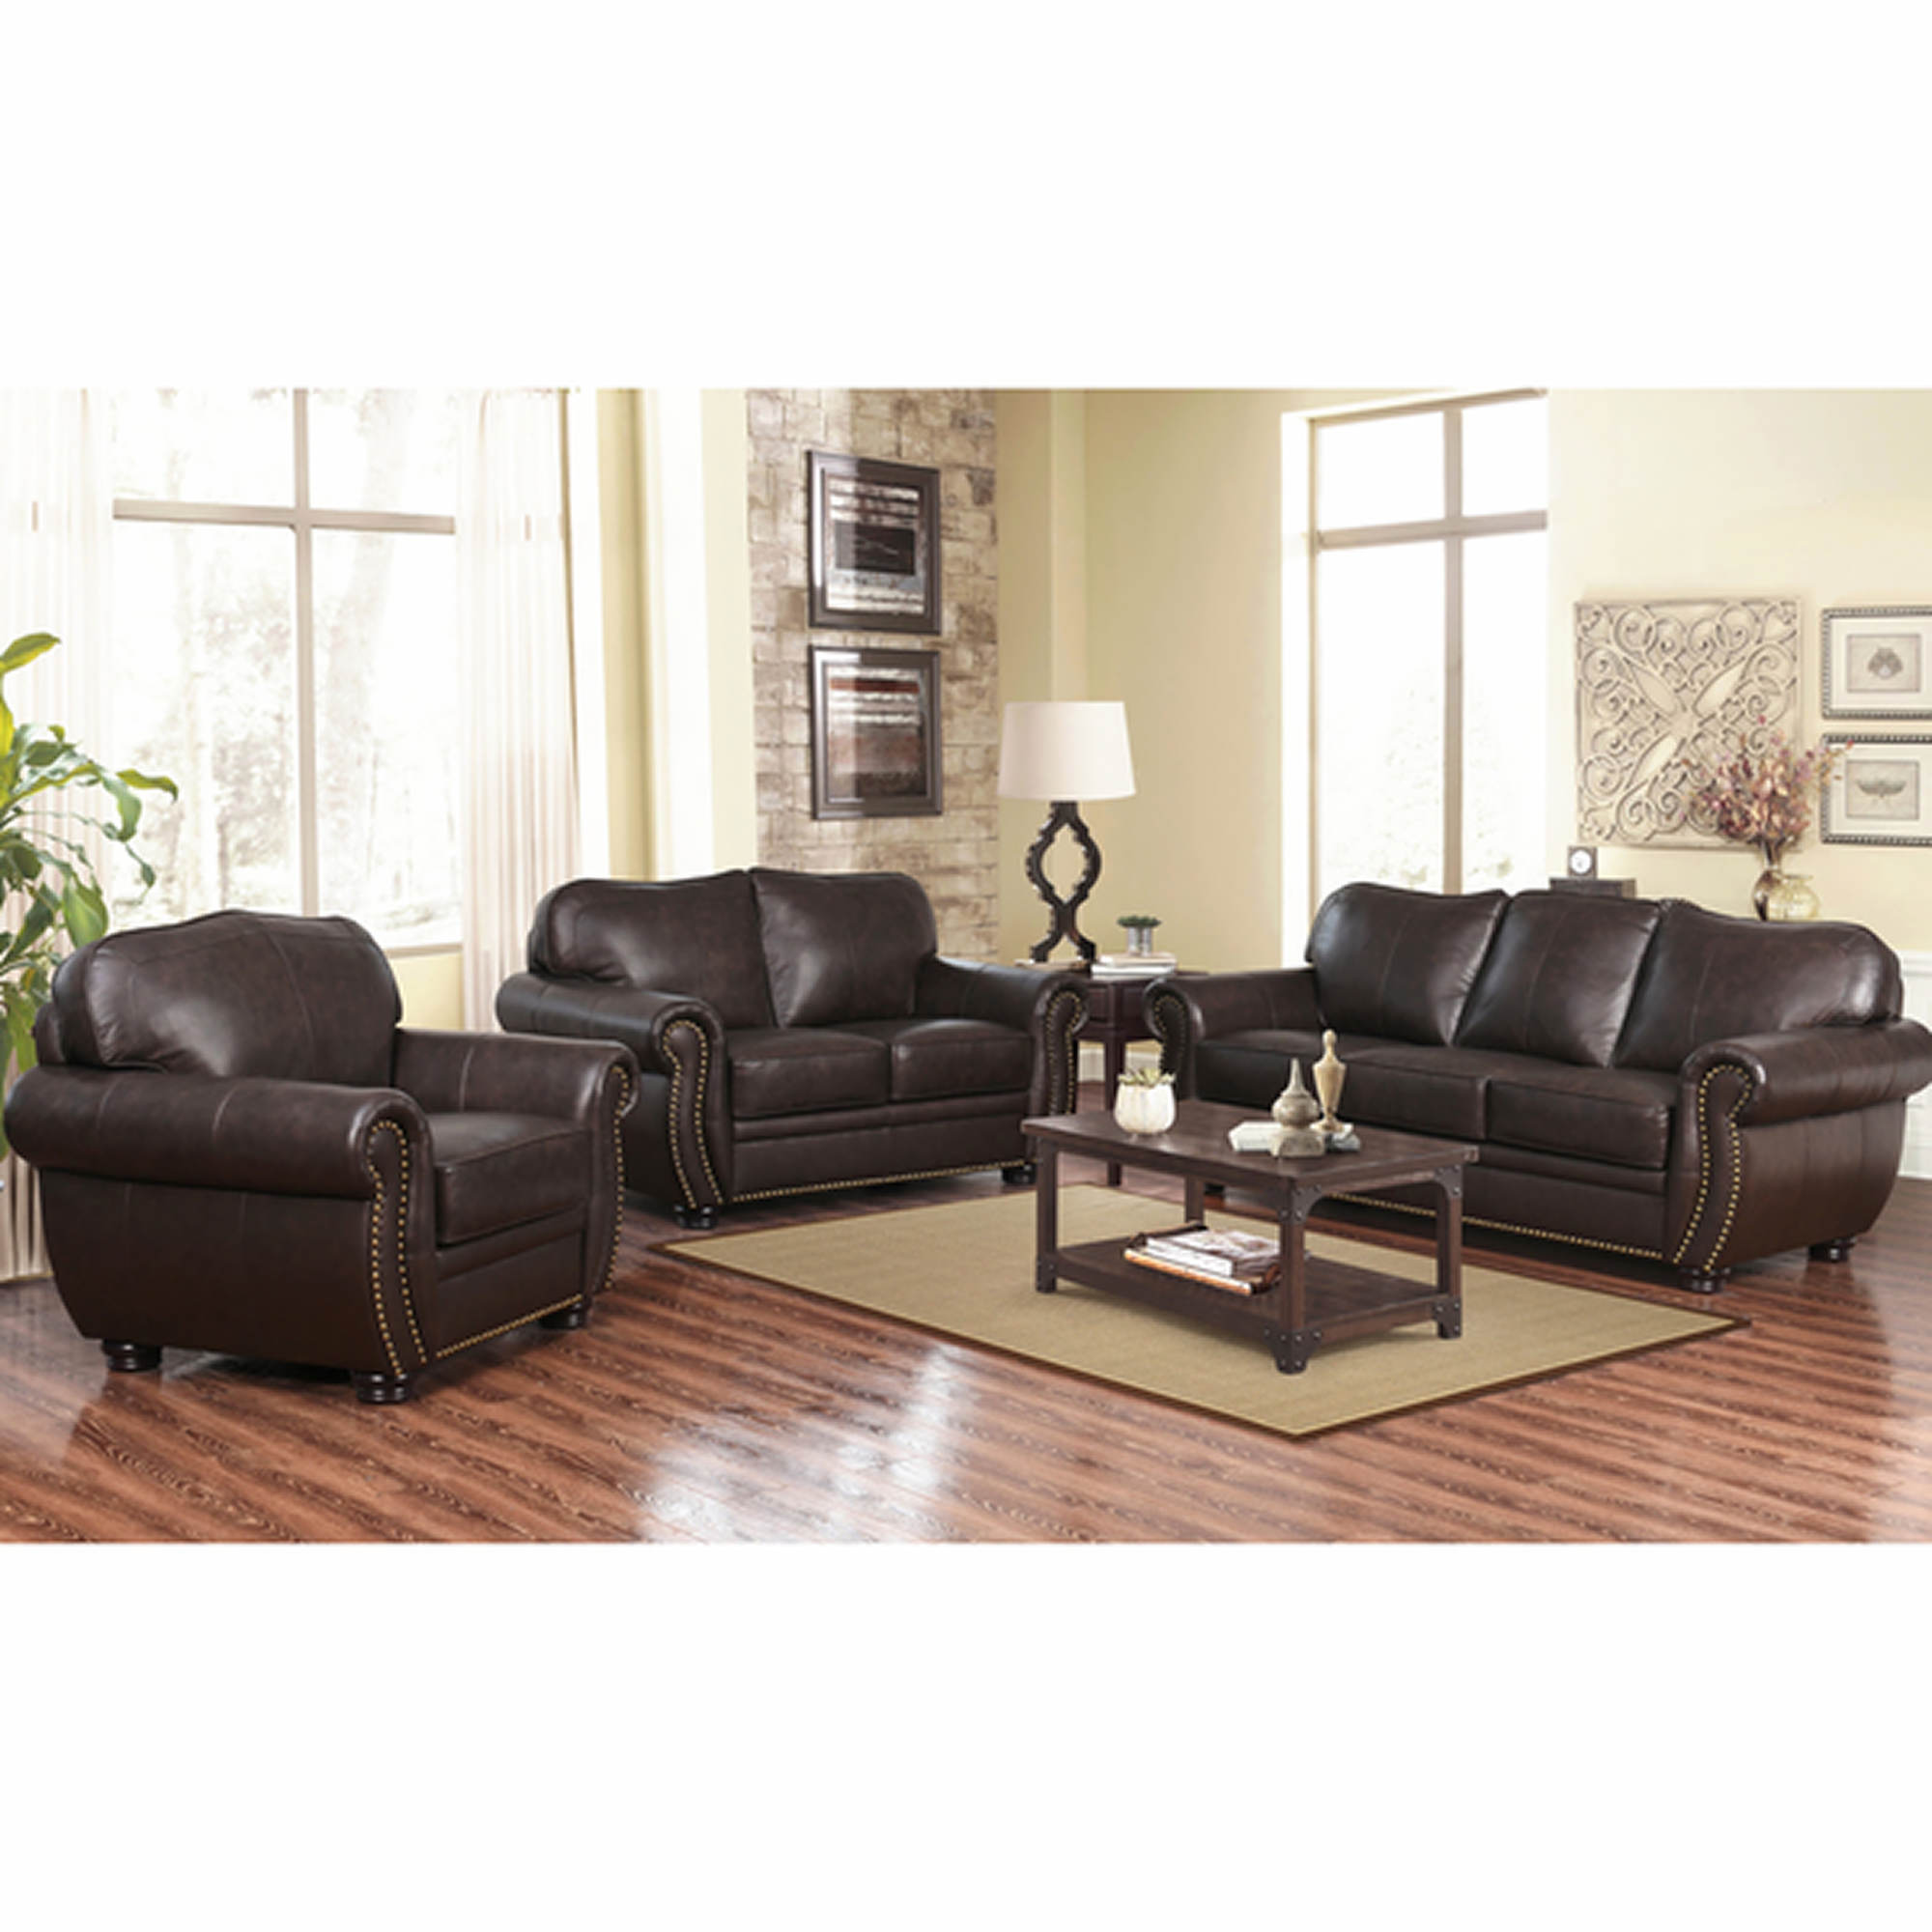 abbyson living barrington 3-pc. top-grain leather living room set